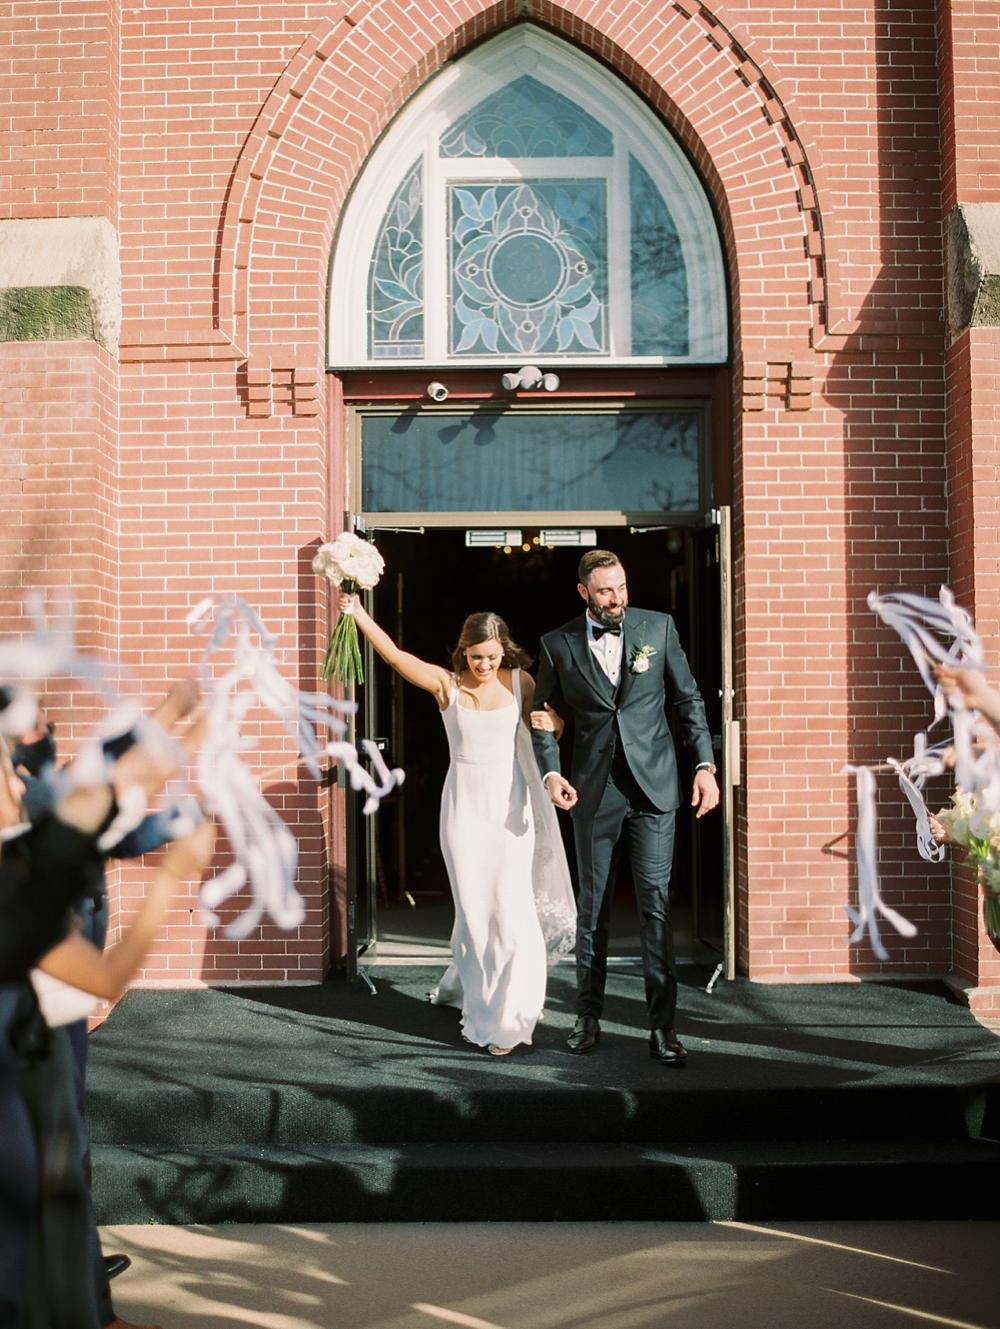 Kristin-La-Voie-Photography-austin-houston-texas-wedding-photographer-the-oaks-at-high-hill -41